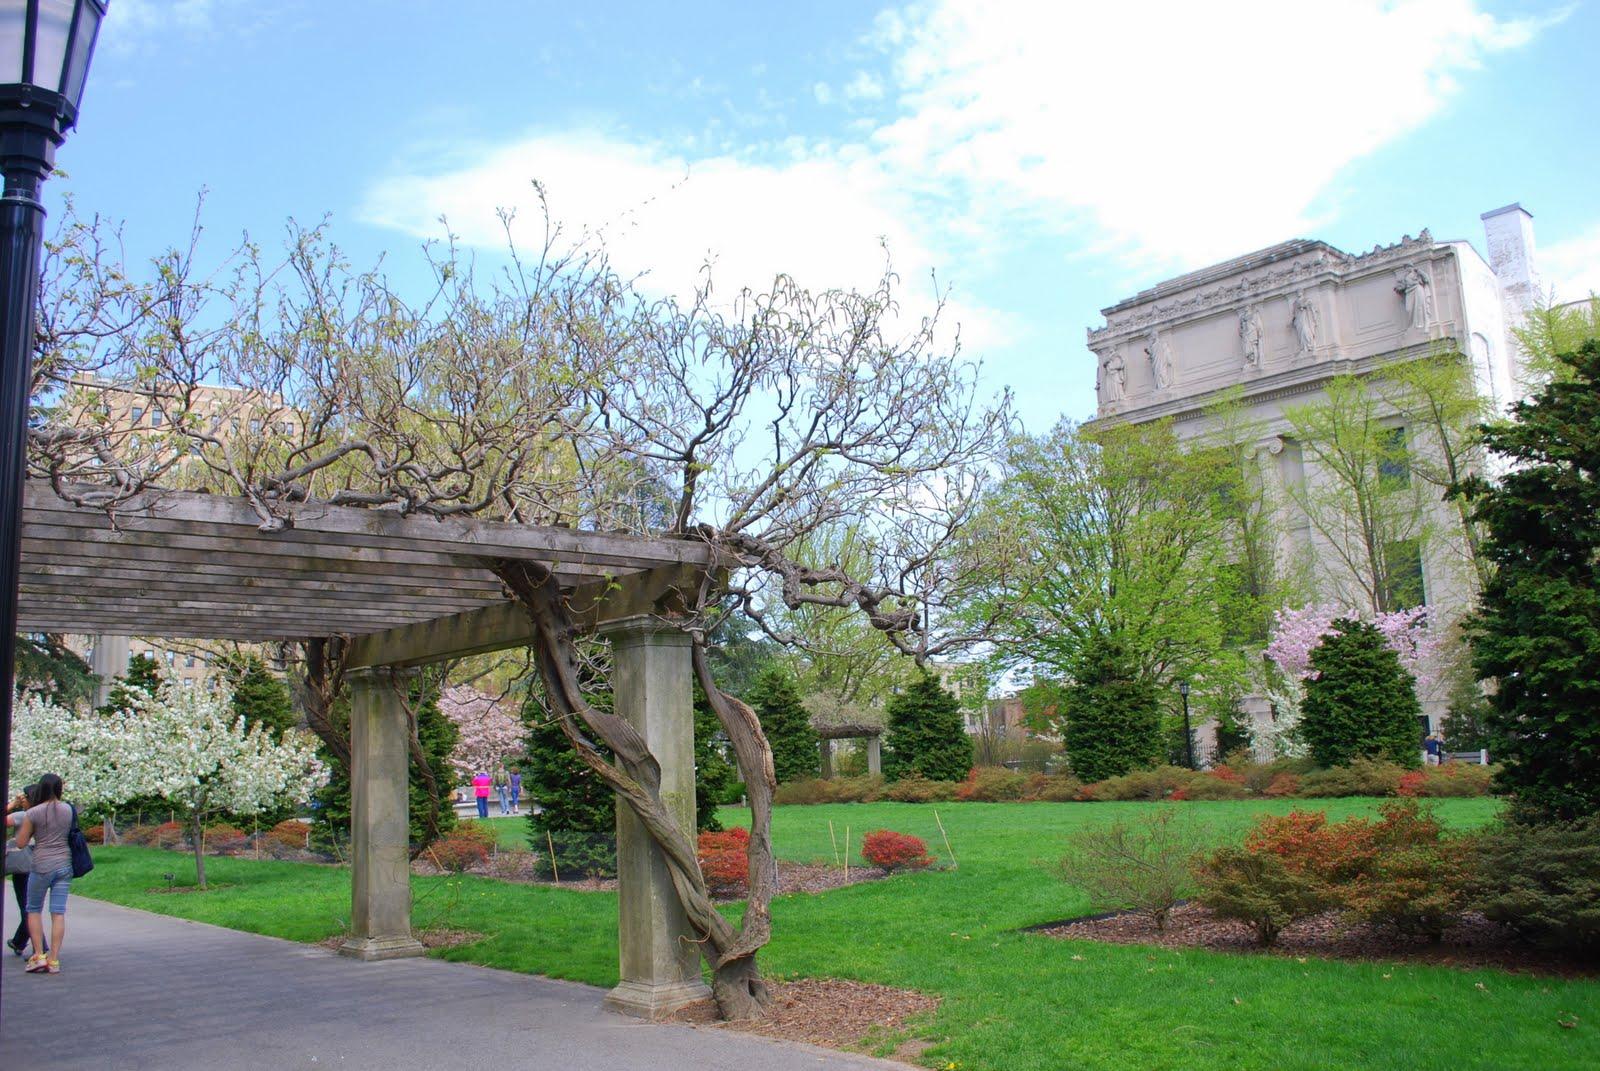 mille fiori favoriti magnolia trees in the brooklyn botanic garden